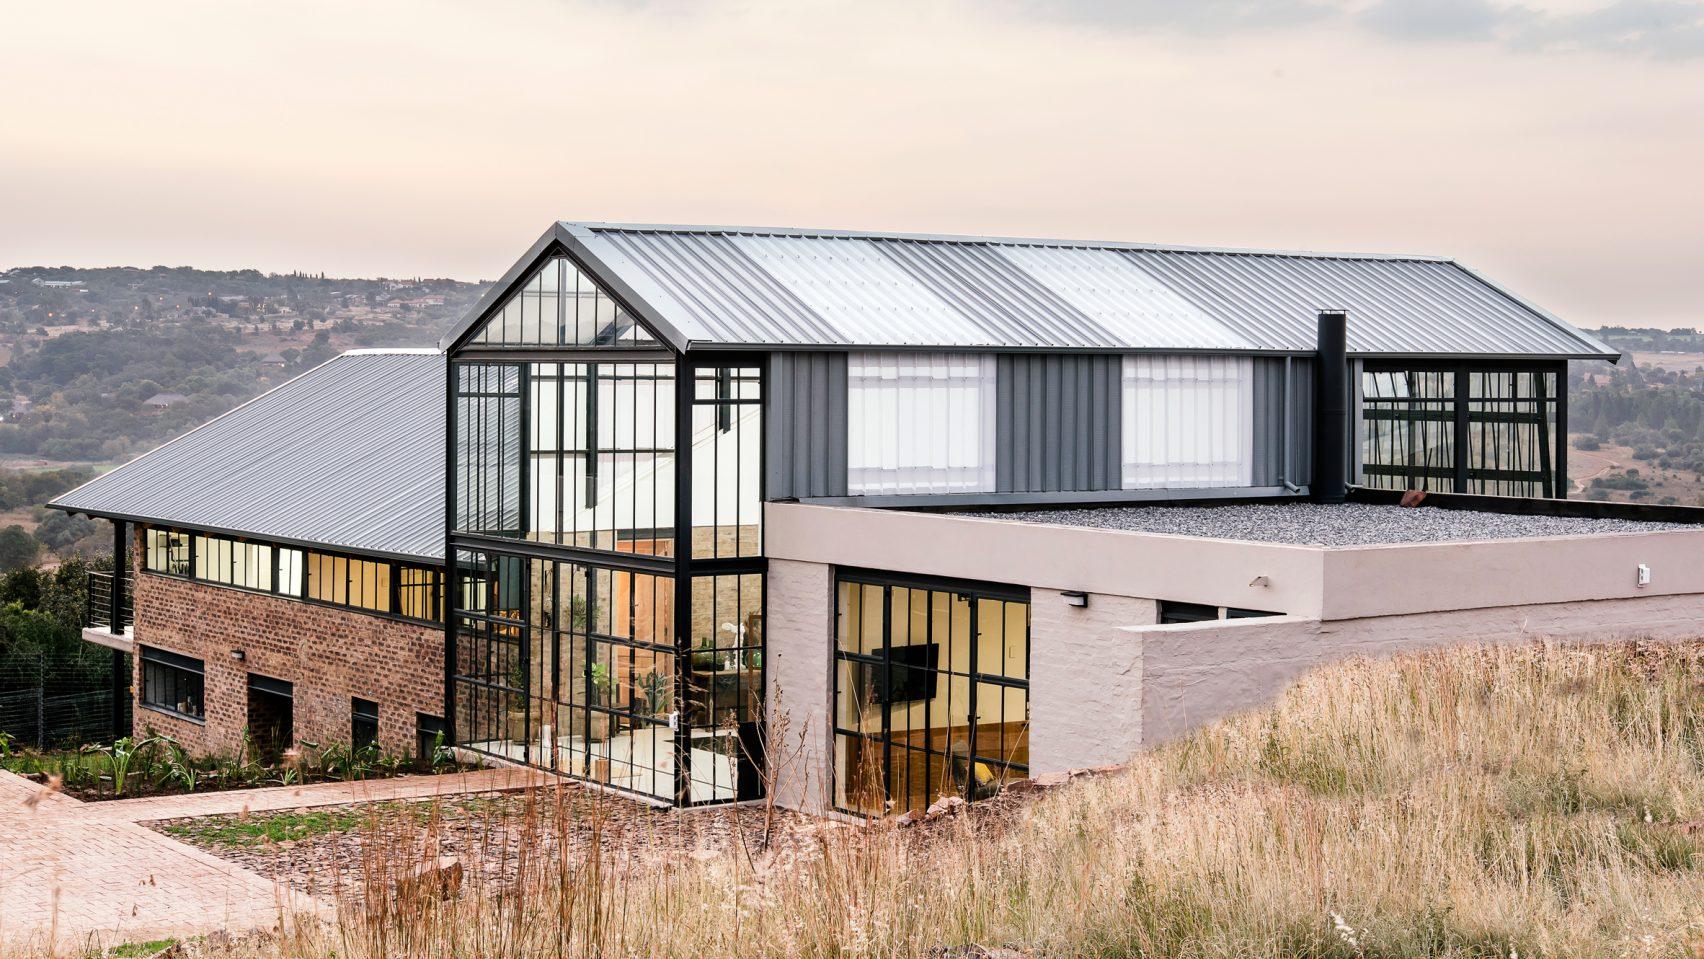 conservatory-house-nadine-englebrecht-architecture-south-africa_dezeen_2364_hero-1704×959